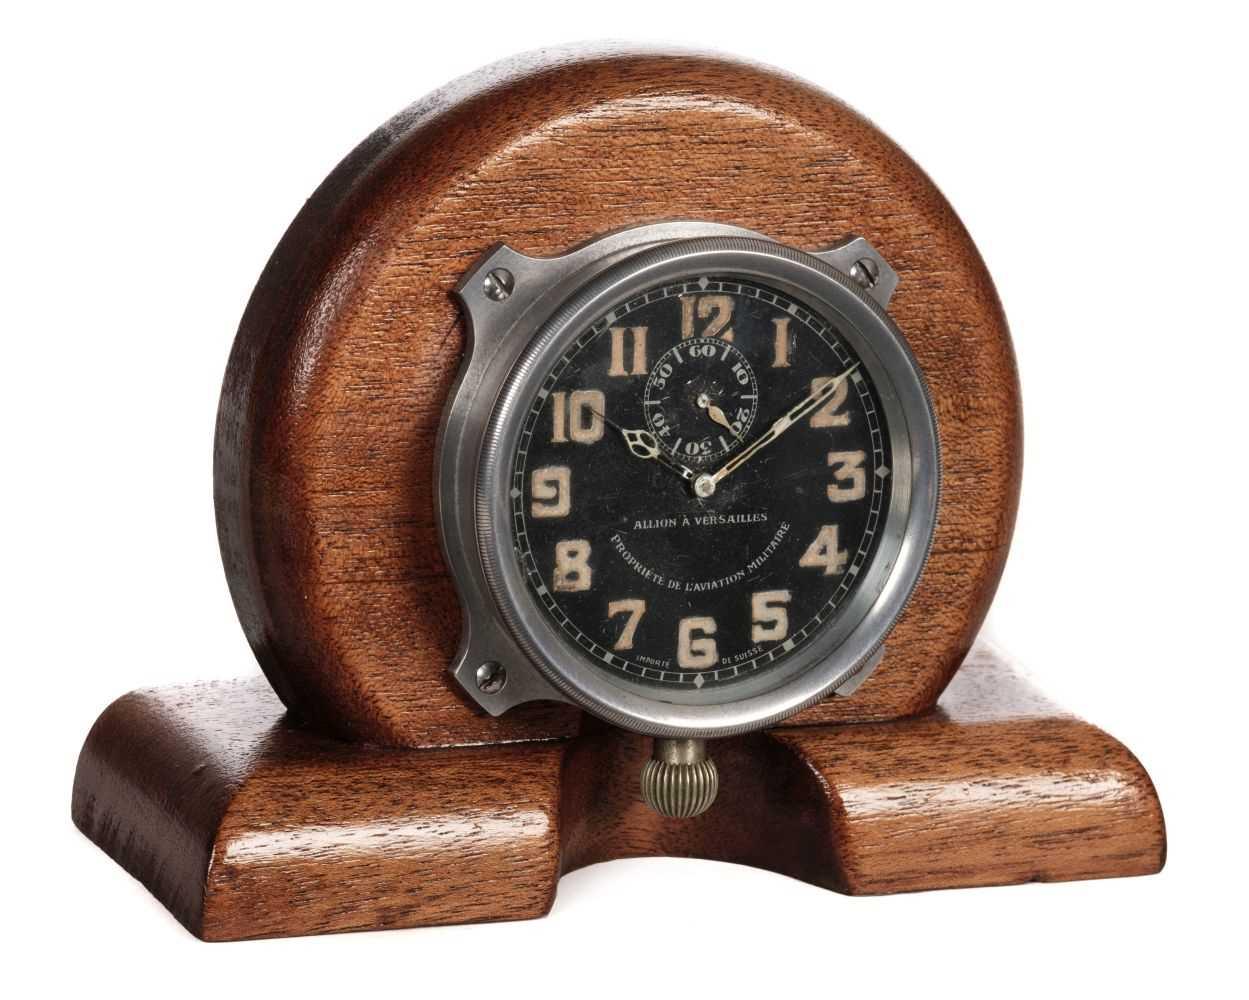 Lot 2-Aircraft Clock. A WWI French aircraft clock